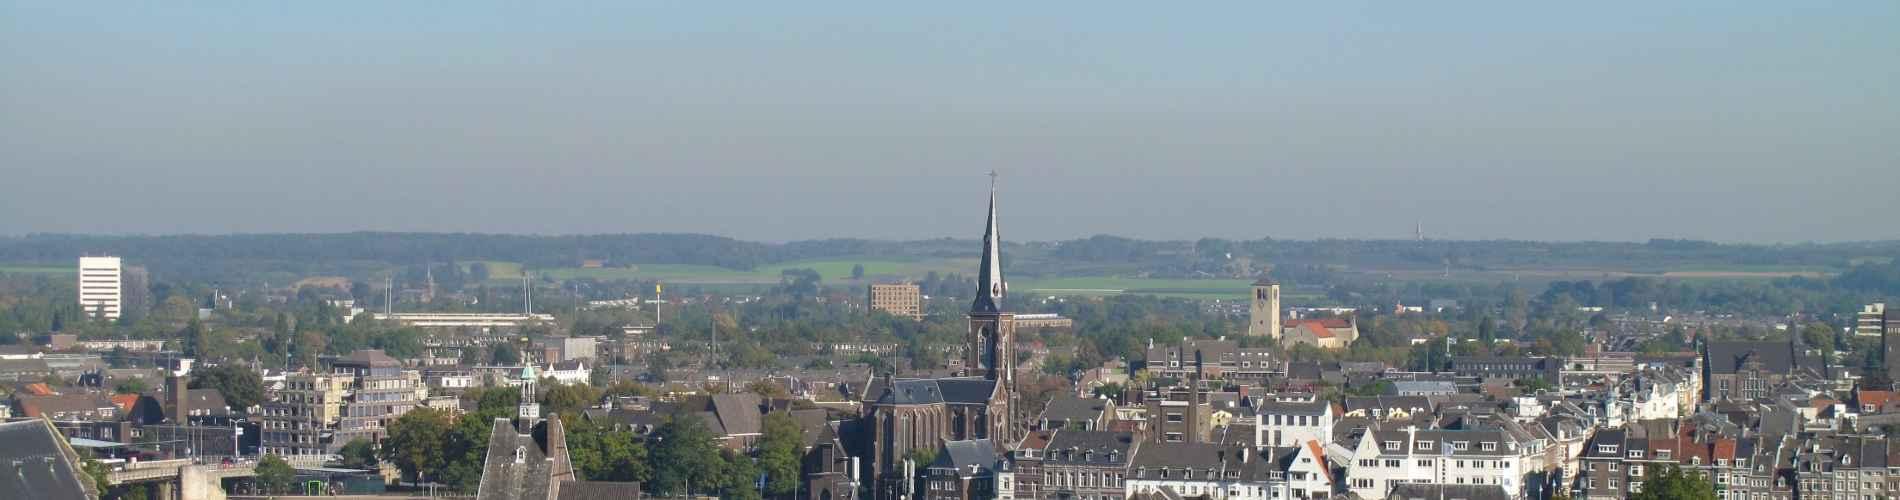 citykamp-maastricht-vlakenburg-1900x500